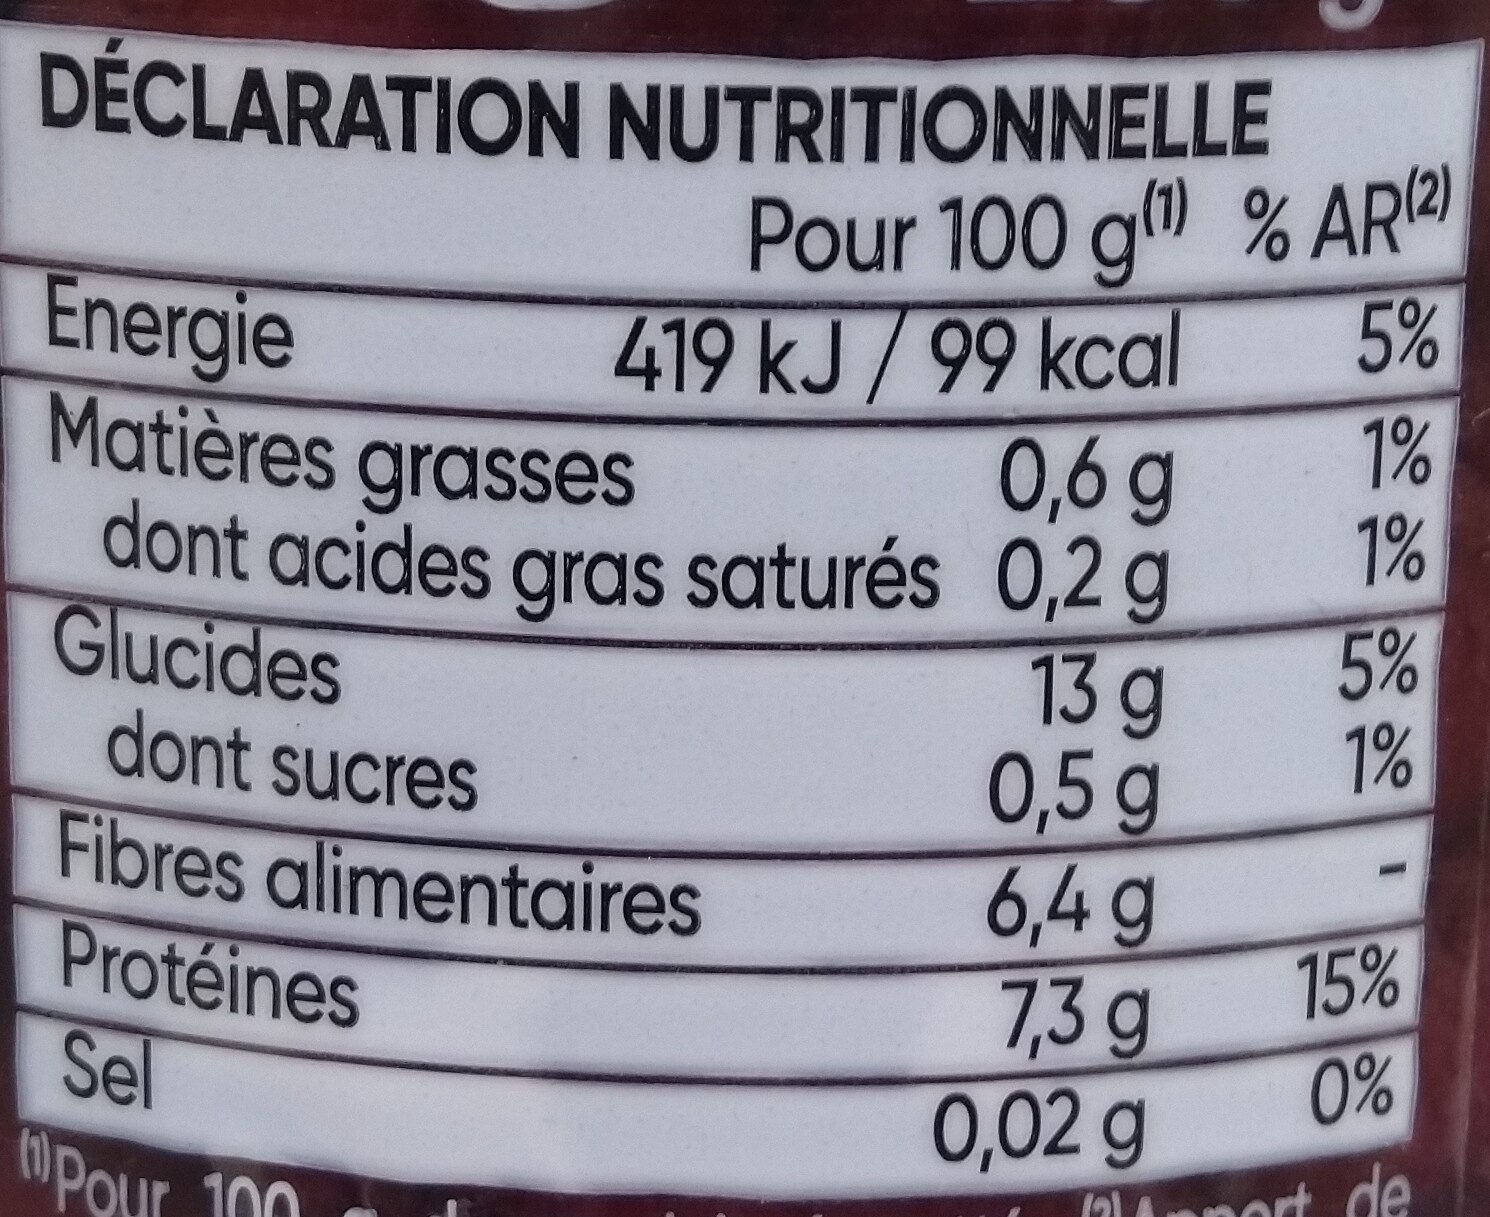 BIEN CULTIVES Haricots rouges - Informations nutritionnelles - fr